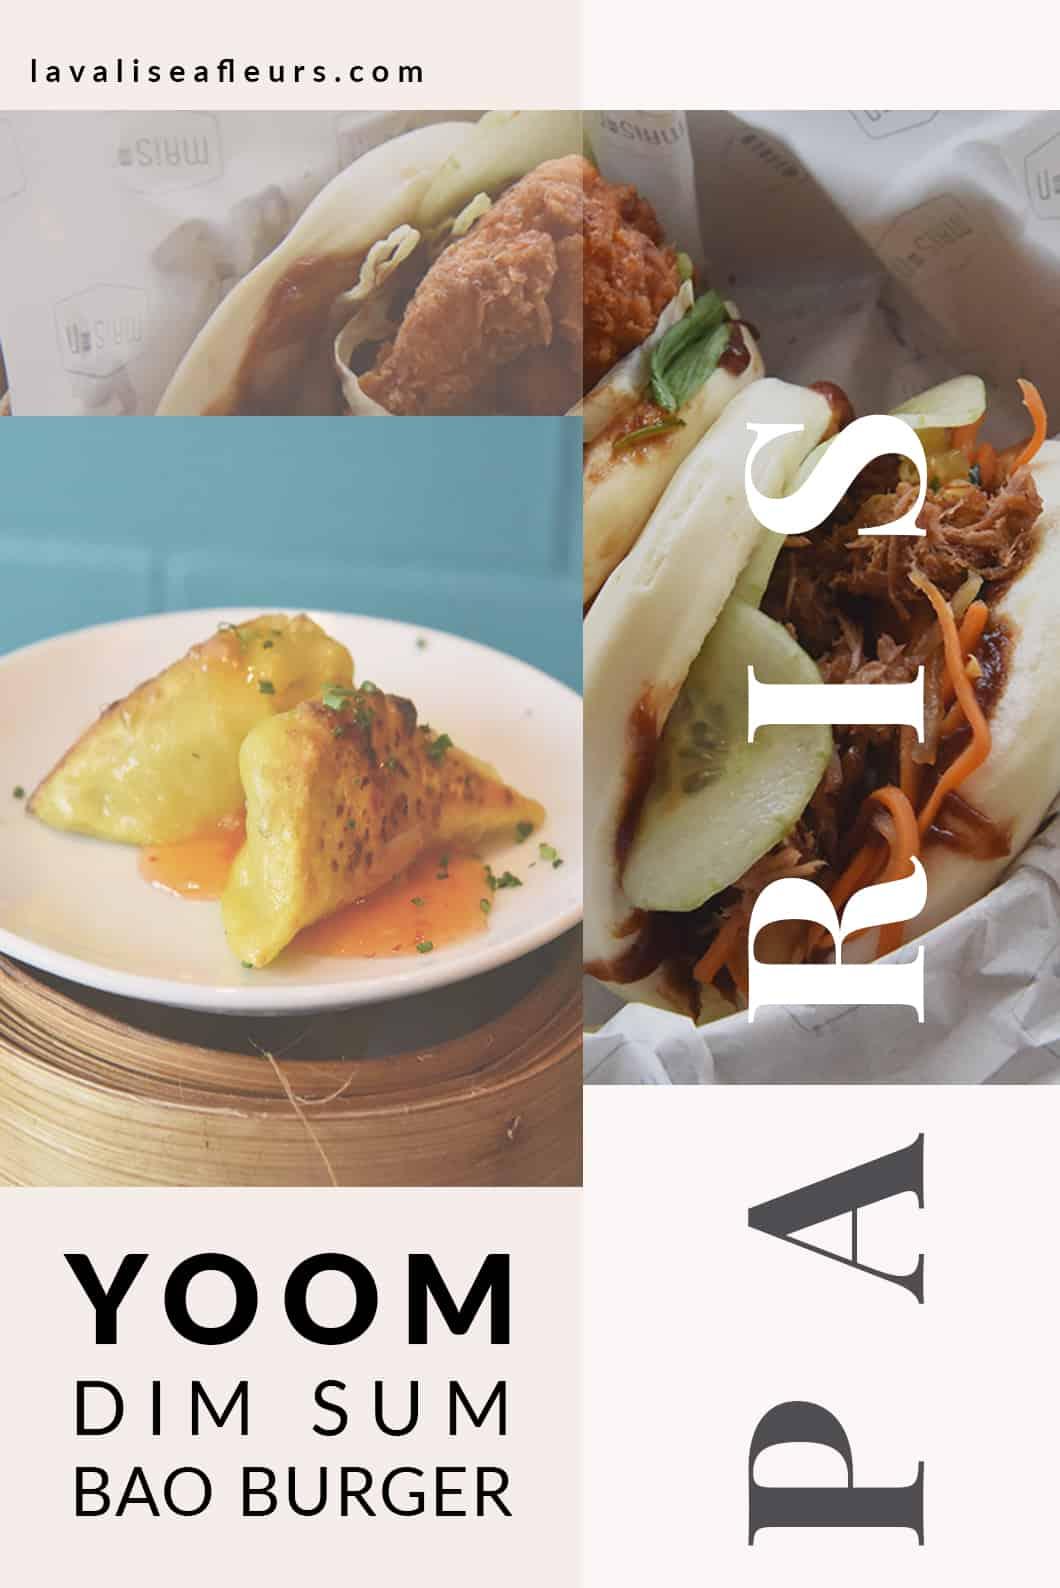 Yoom, restaurant de dim sum et bao burger à Paris